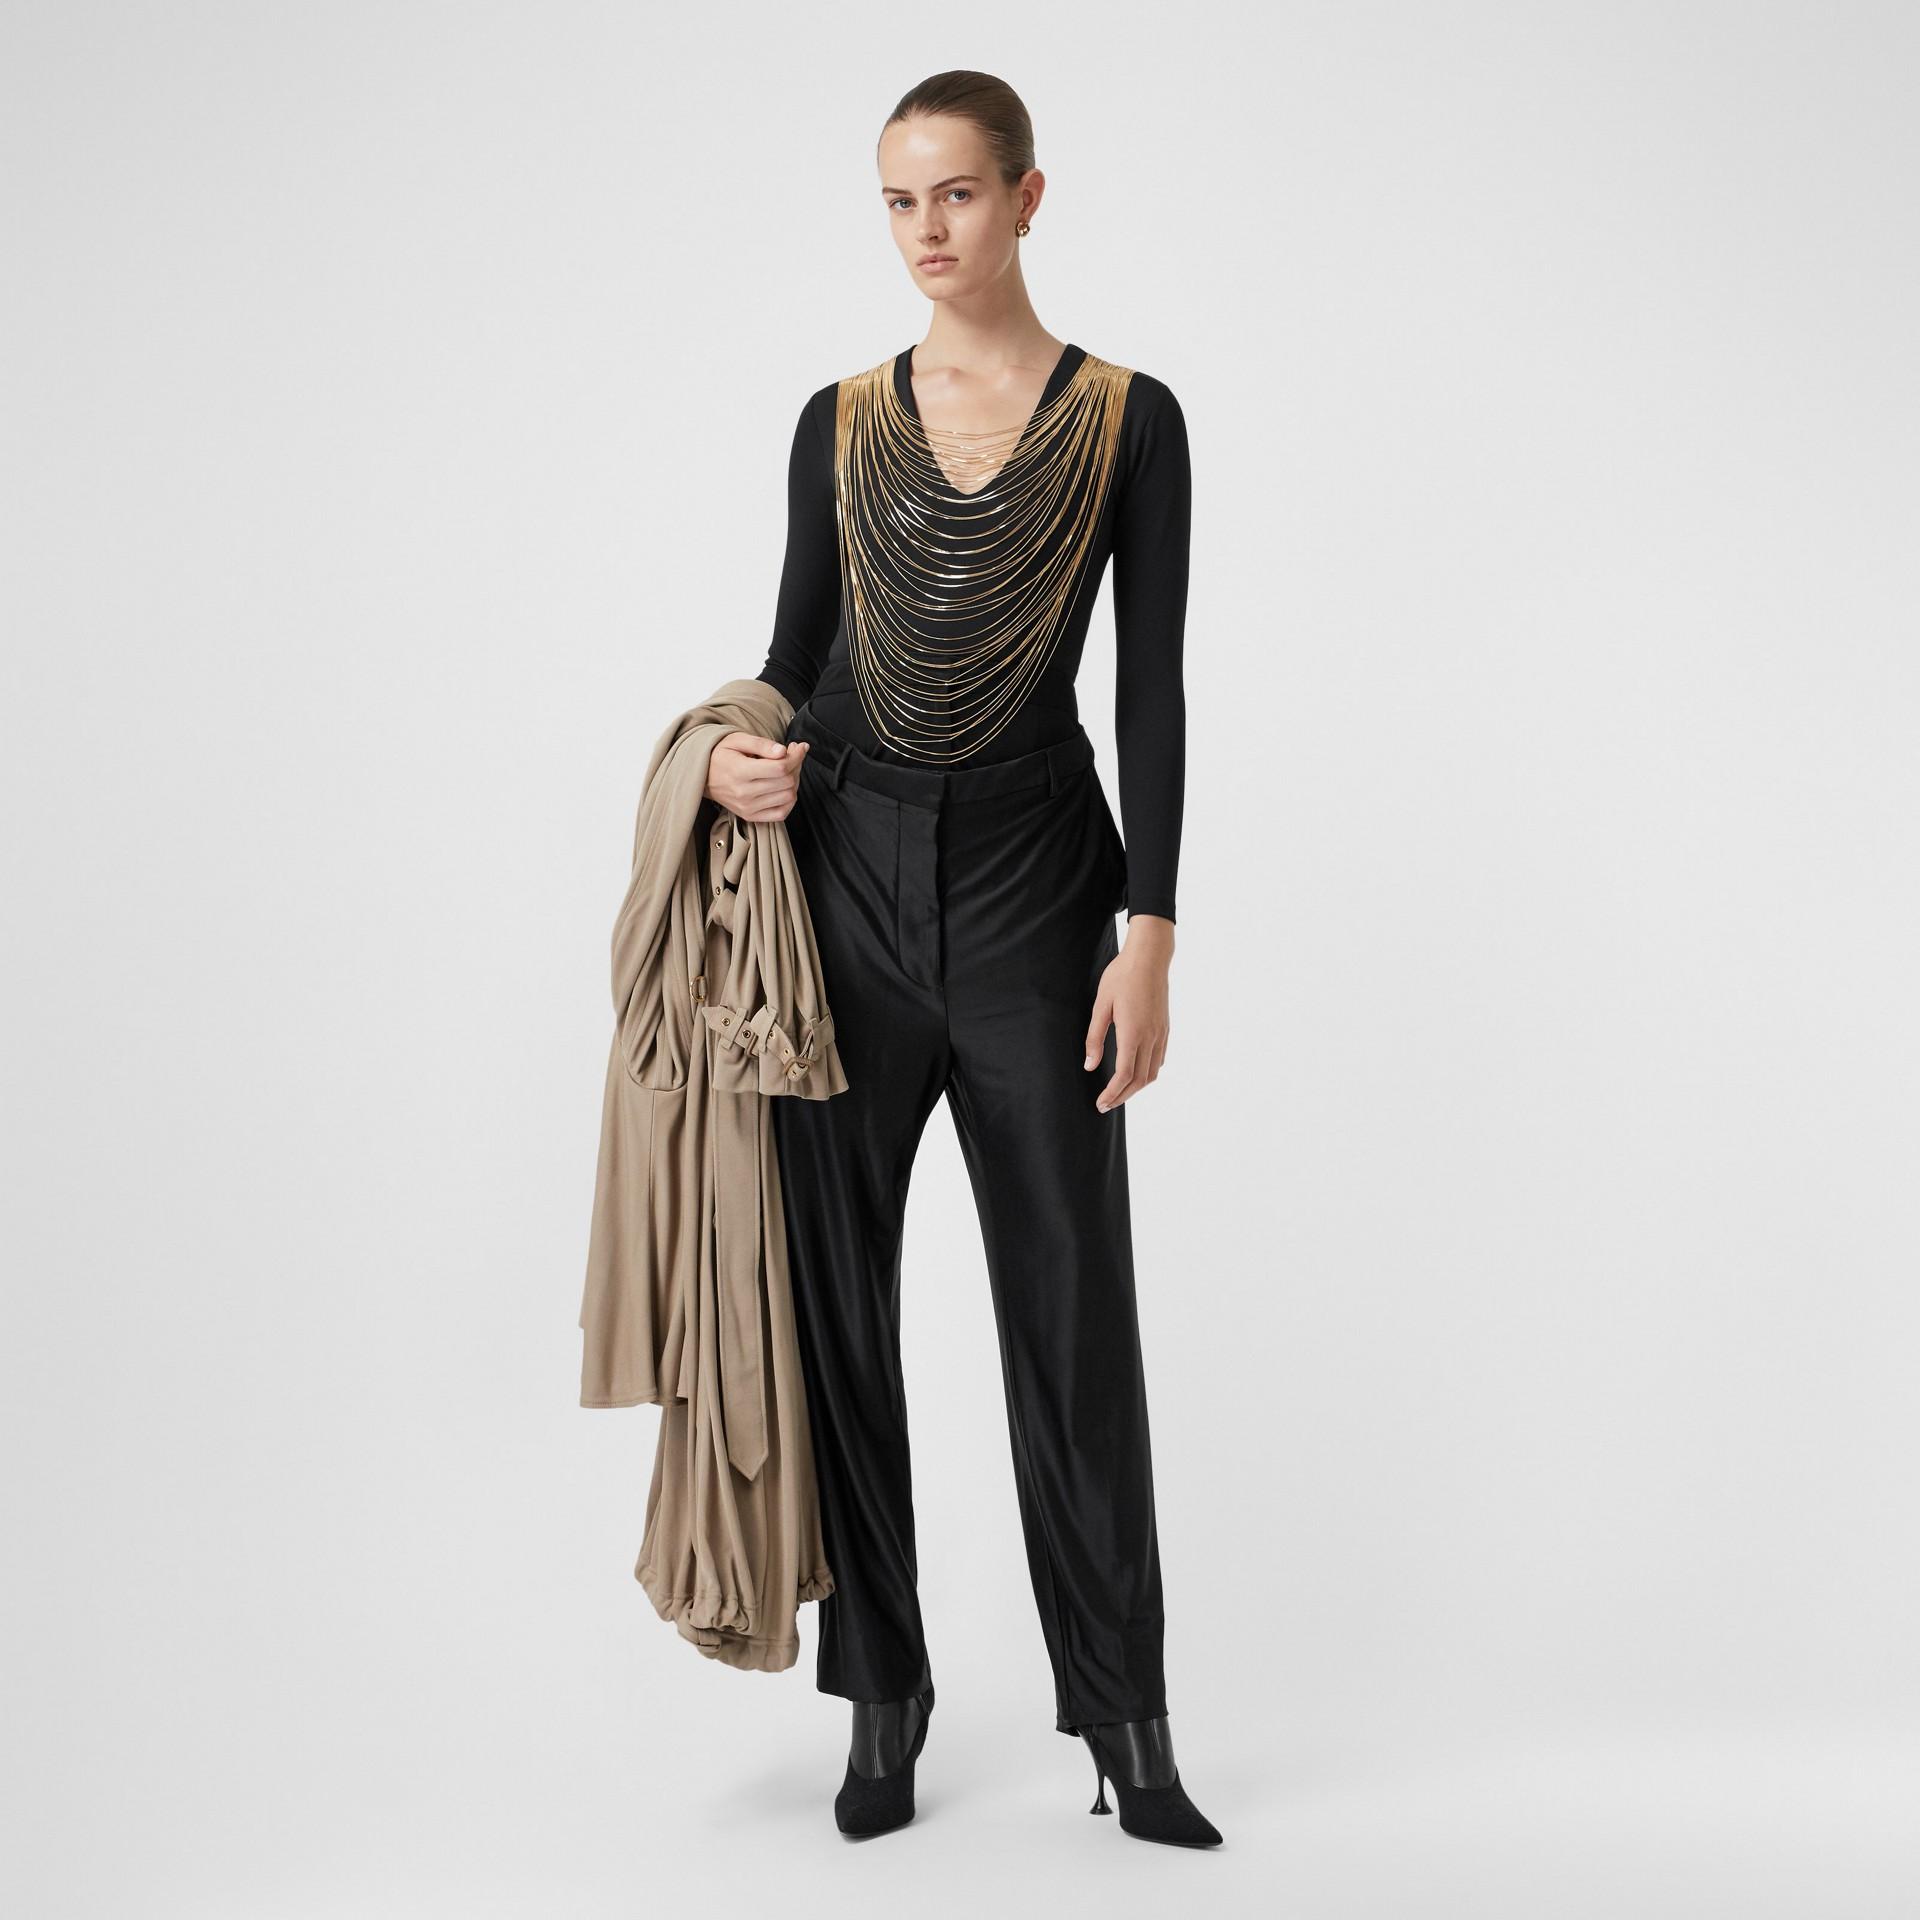 Chain Detail Stretch Jersey Bodysuit in Black - Women | Burberry United Kingdom - gallery image 4